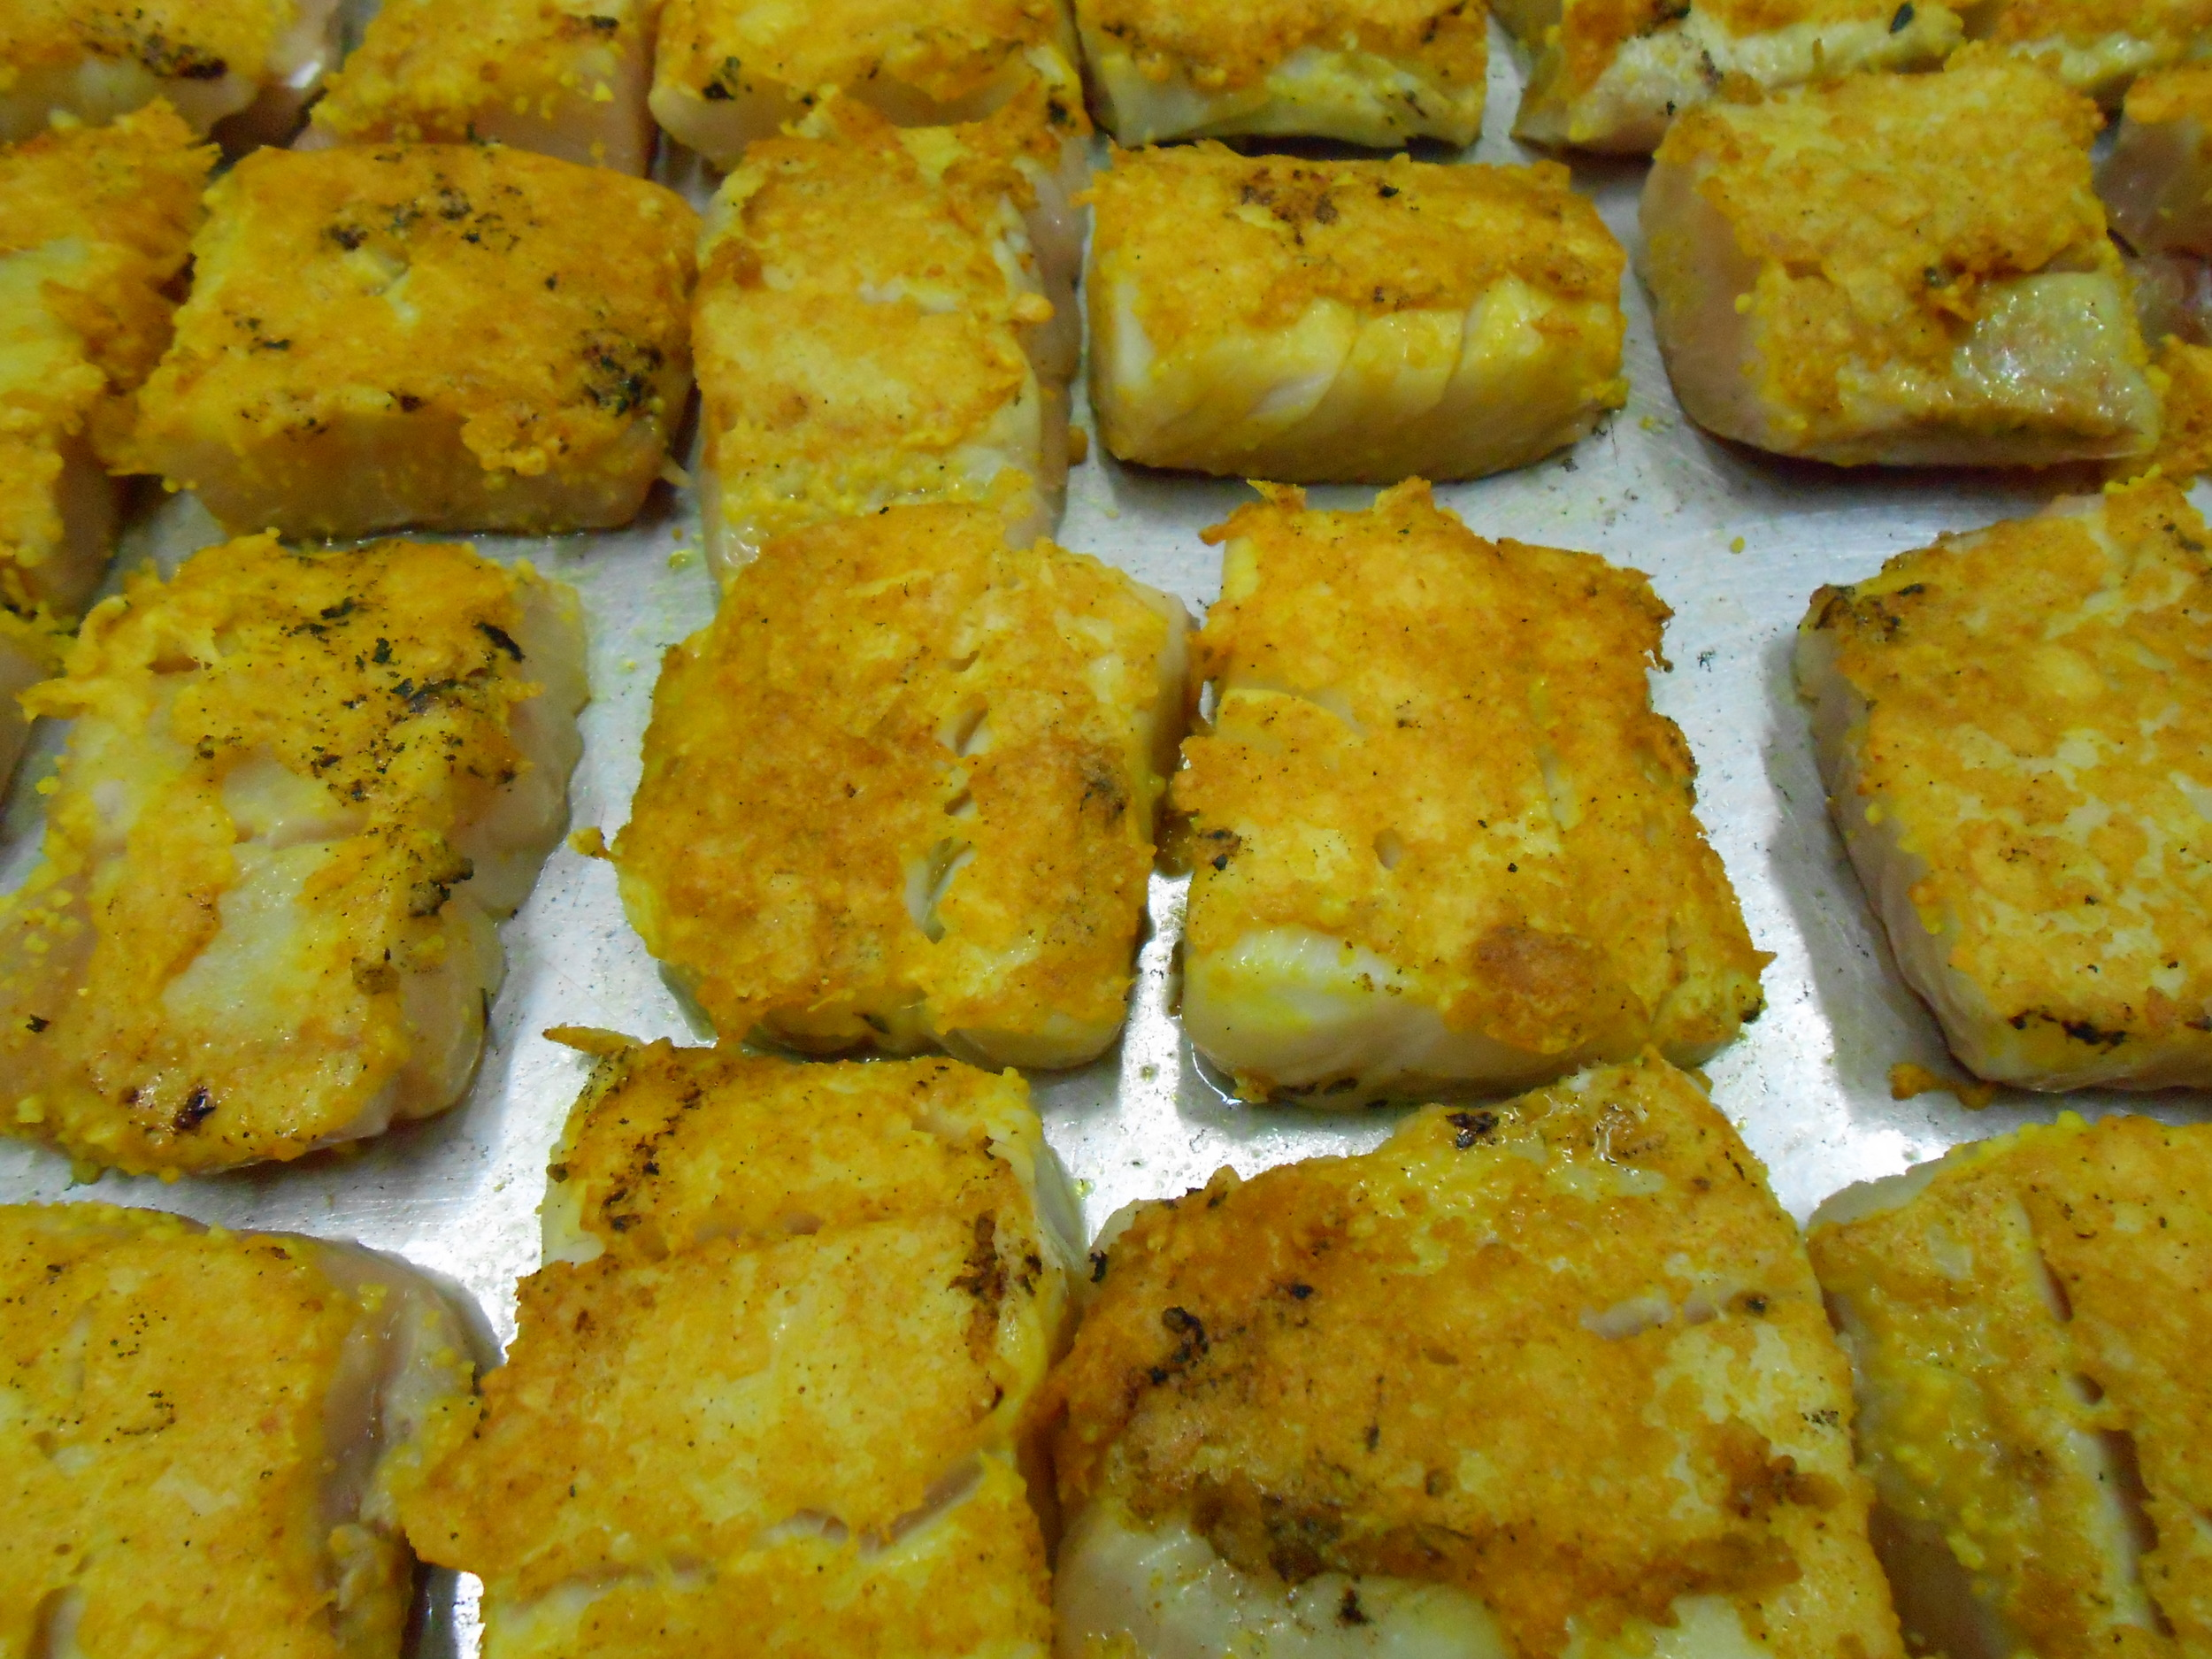 Parmesan-encrusted pollock